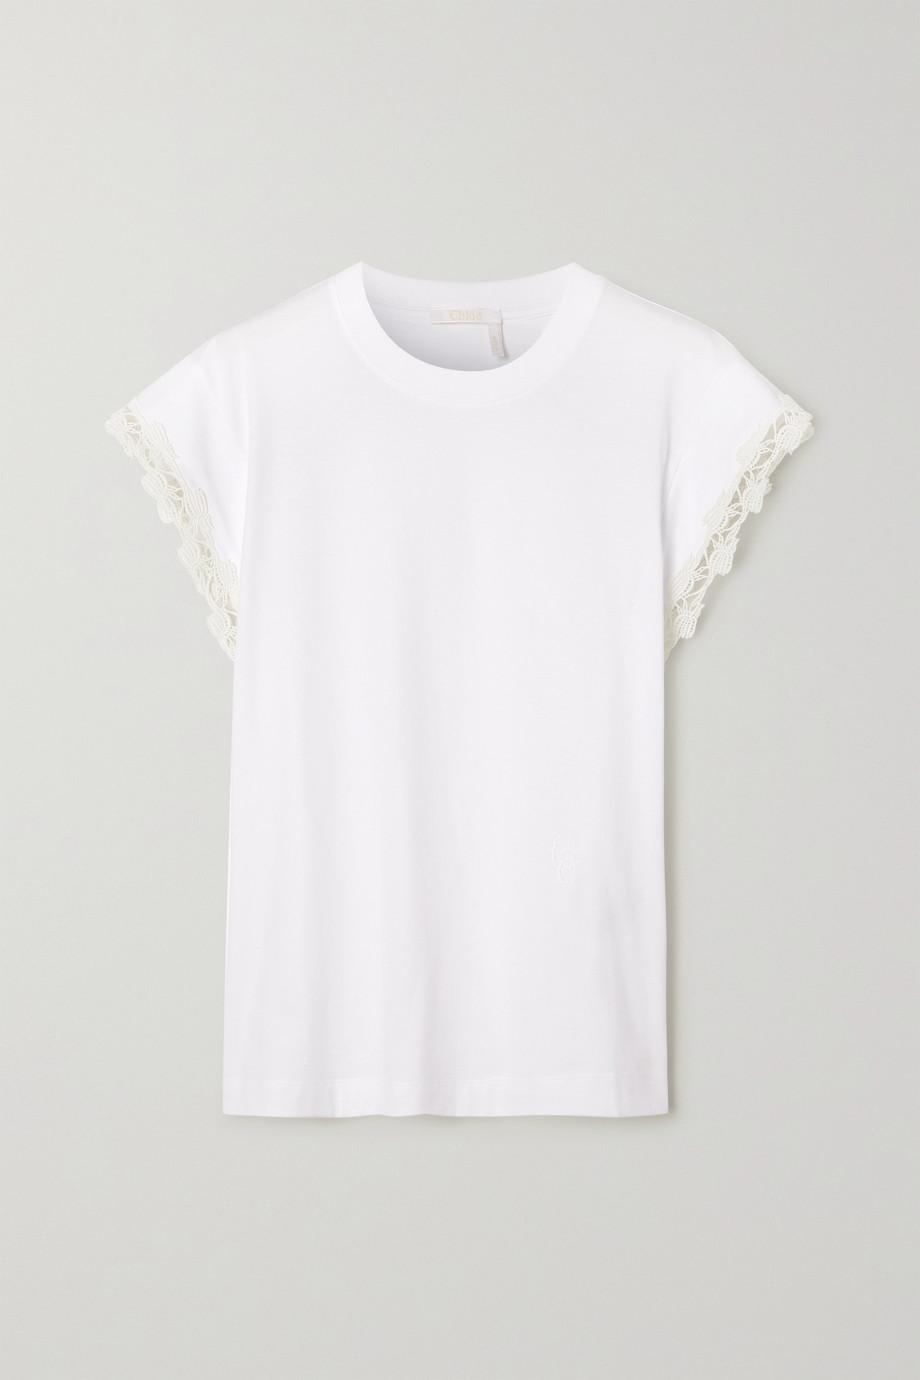 Chloé Guipure lace-trimmed cotton-jersey top